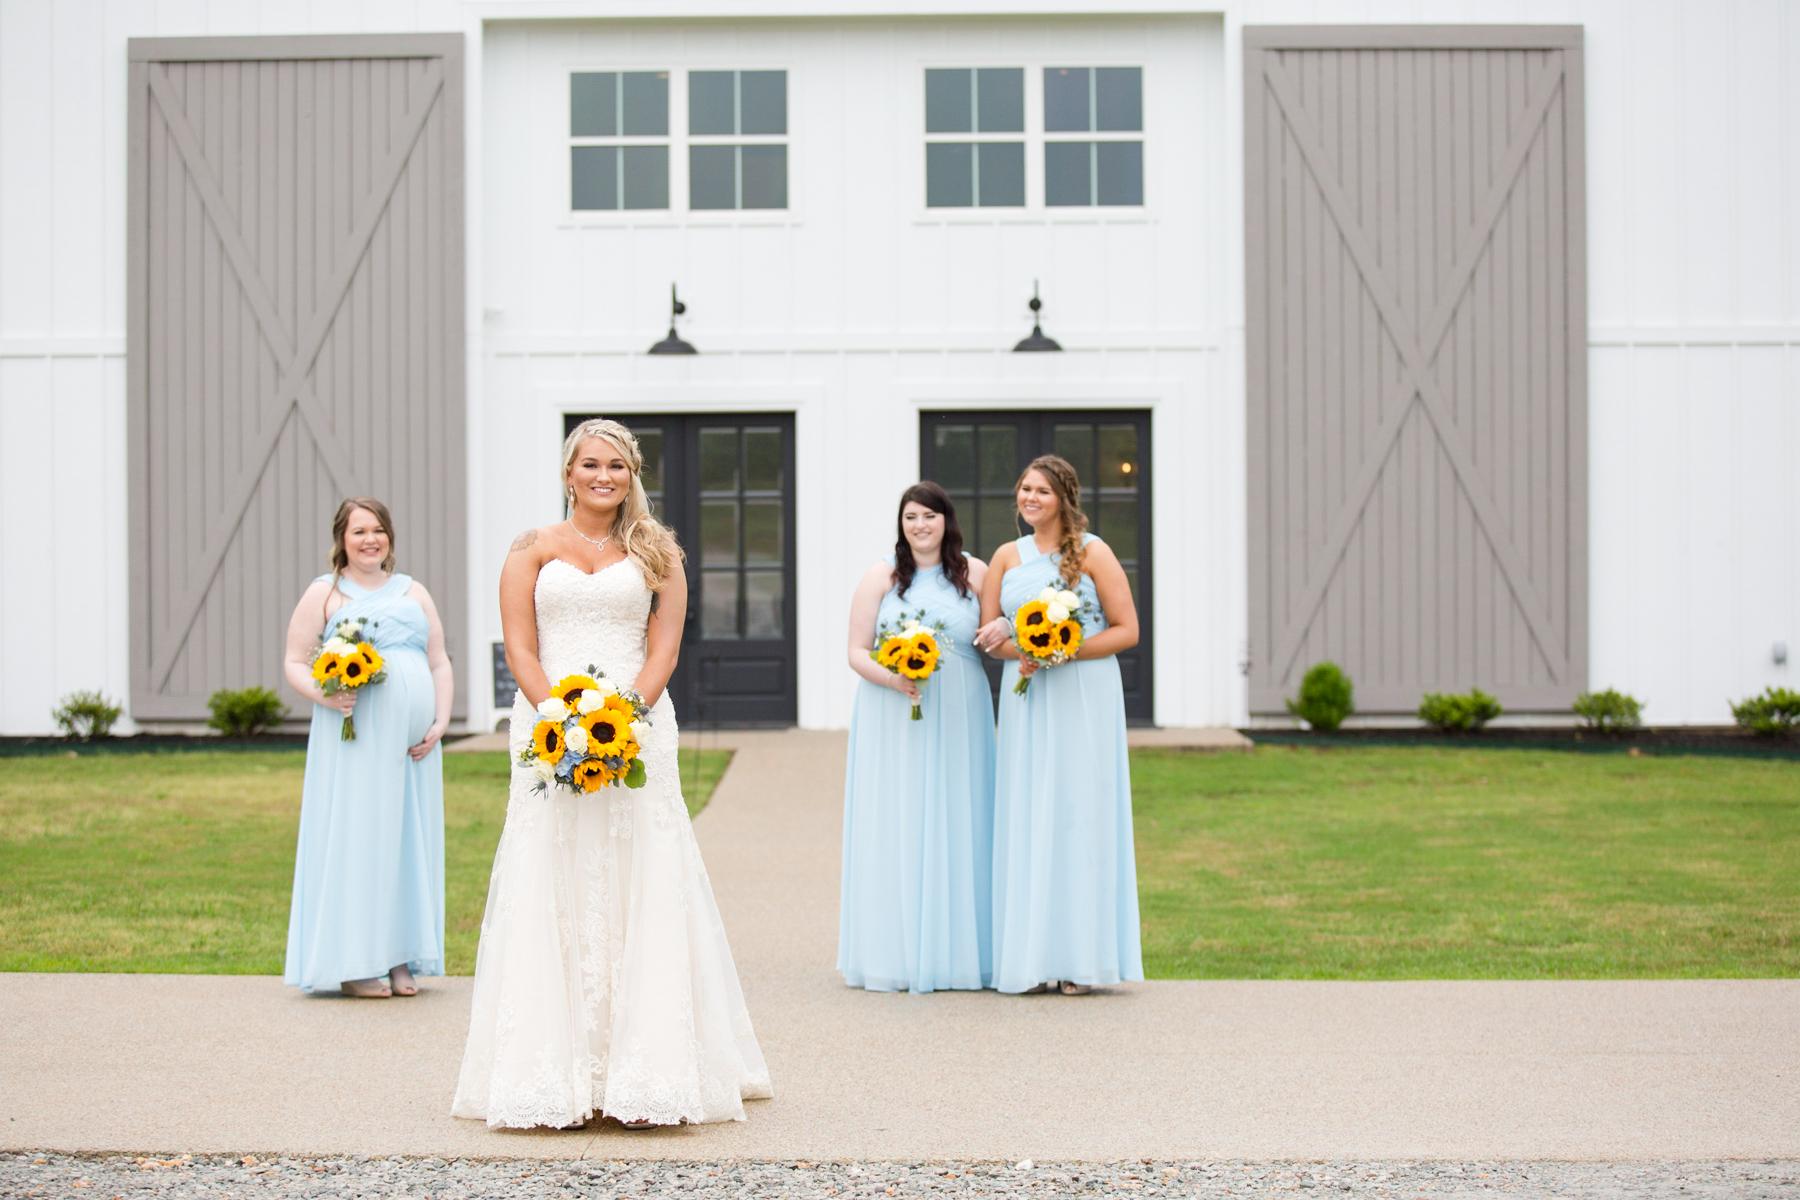 The-venue-at-white-oak-farms-wedding-nashville-wedding-photographers-0122.jpg